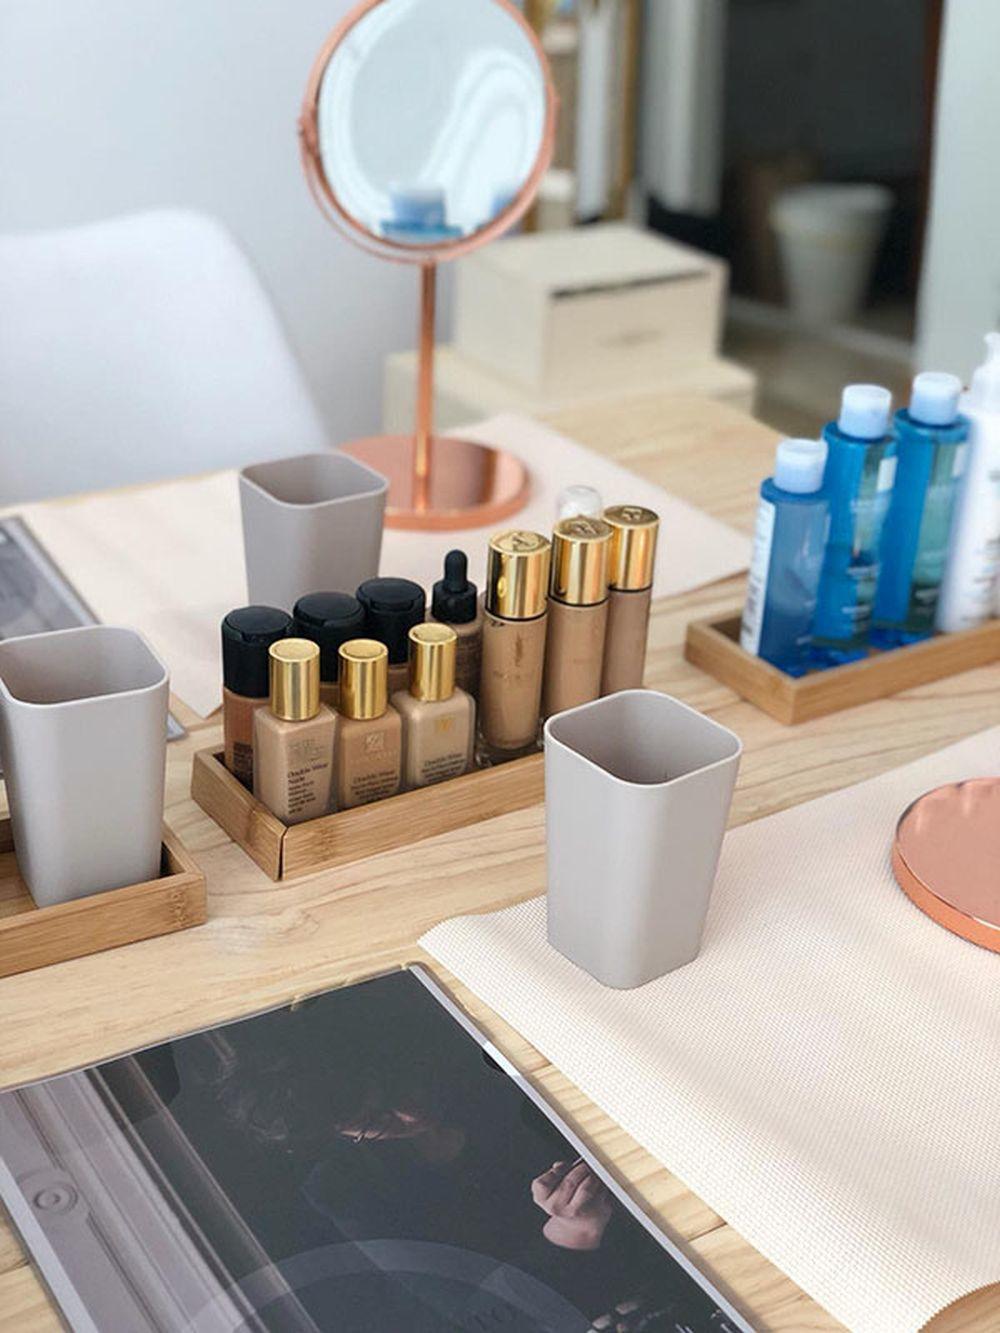 Imagen de los cursos de Cristina Lobato Make Up.